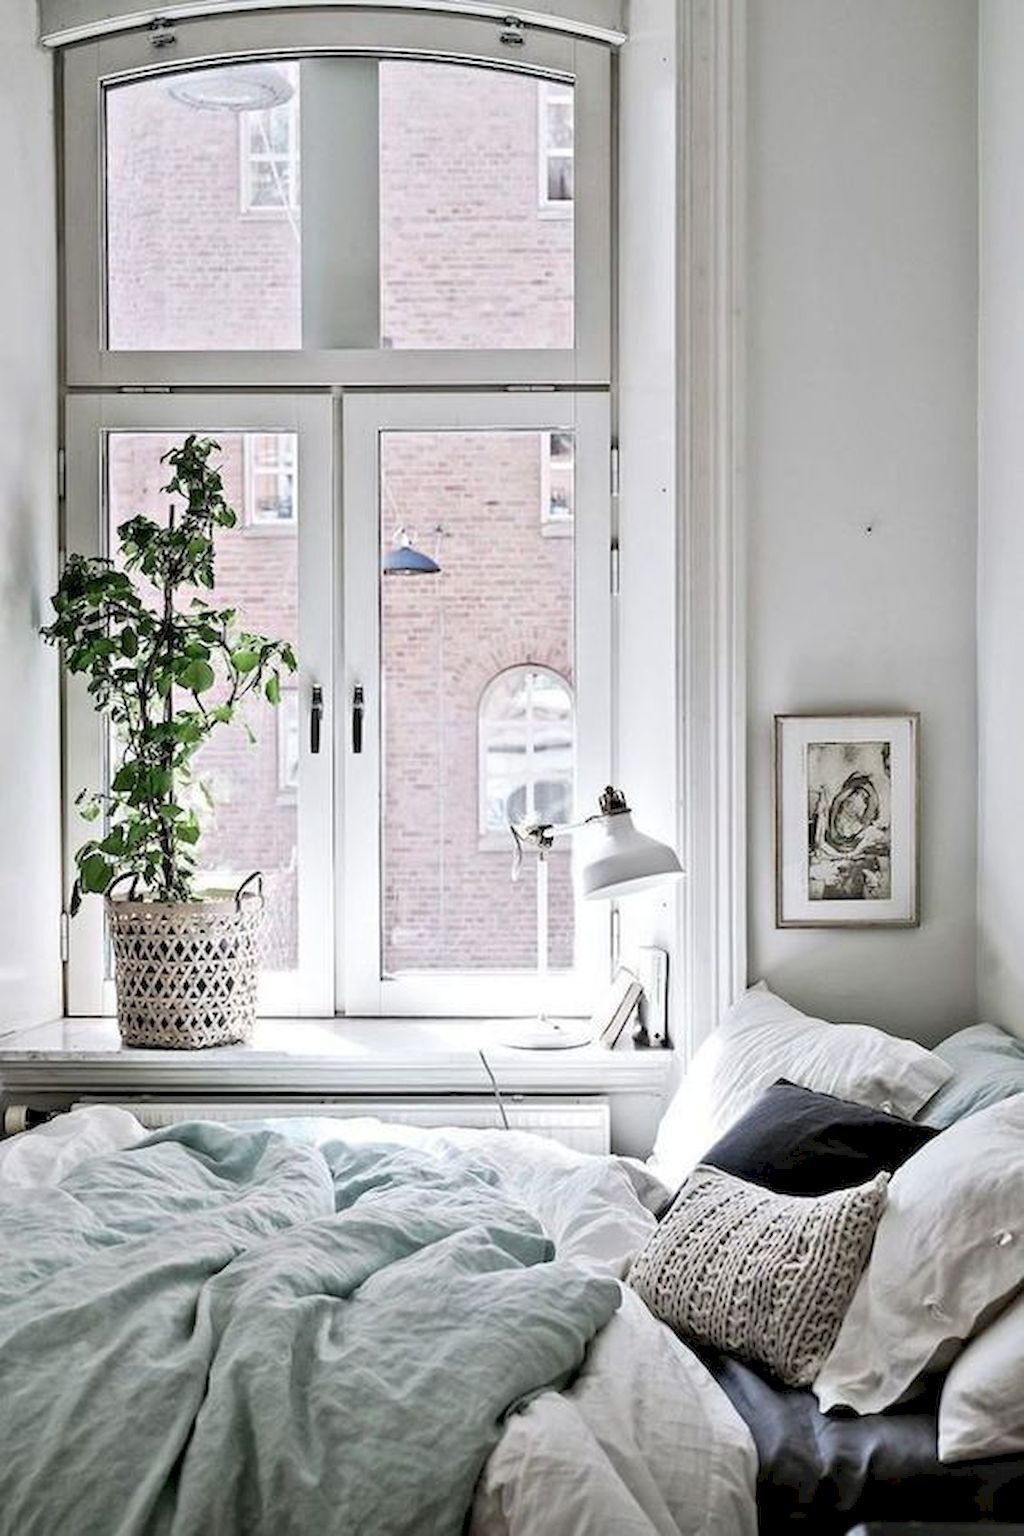 Stunning 75 Beautiful Minimalist Home Decor Ideas Https Crowdecor